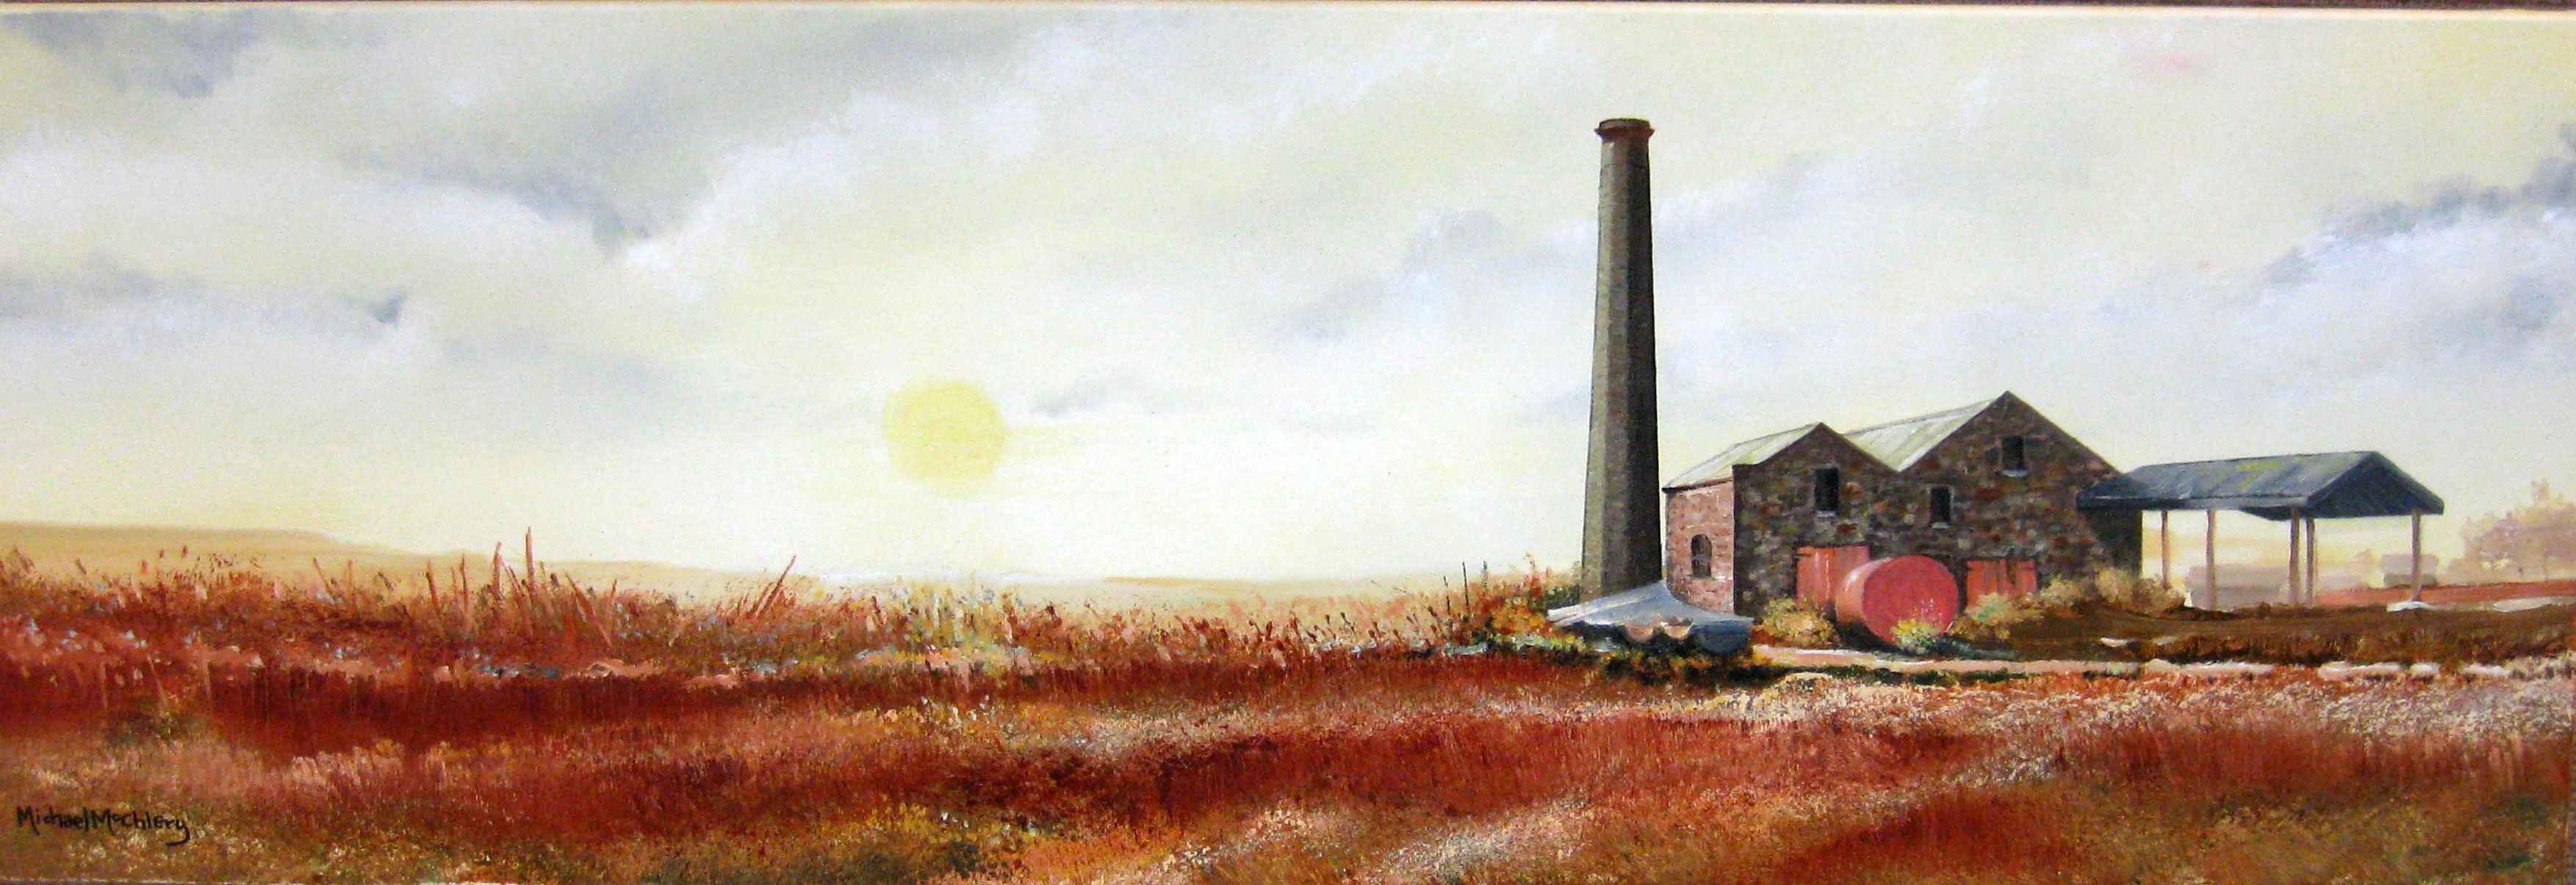 Chimney by Mr Michael Mcchlery - Masterpiece Online